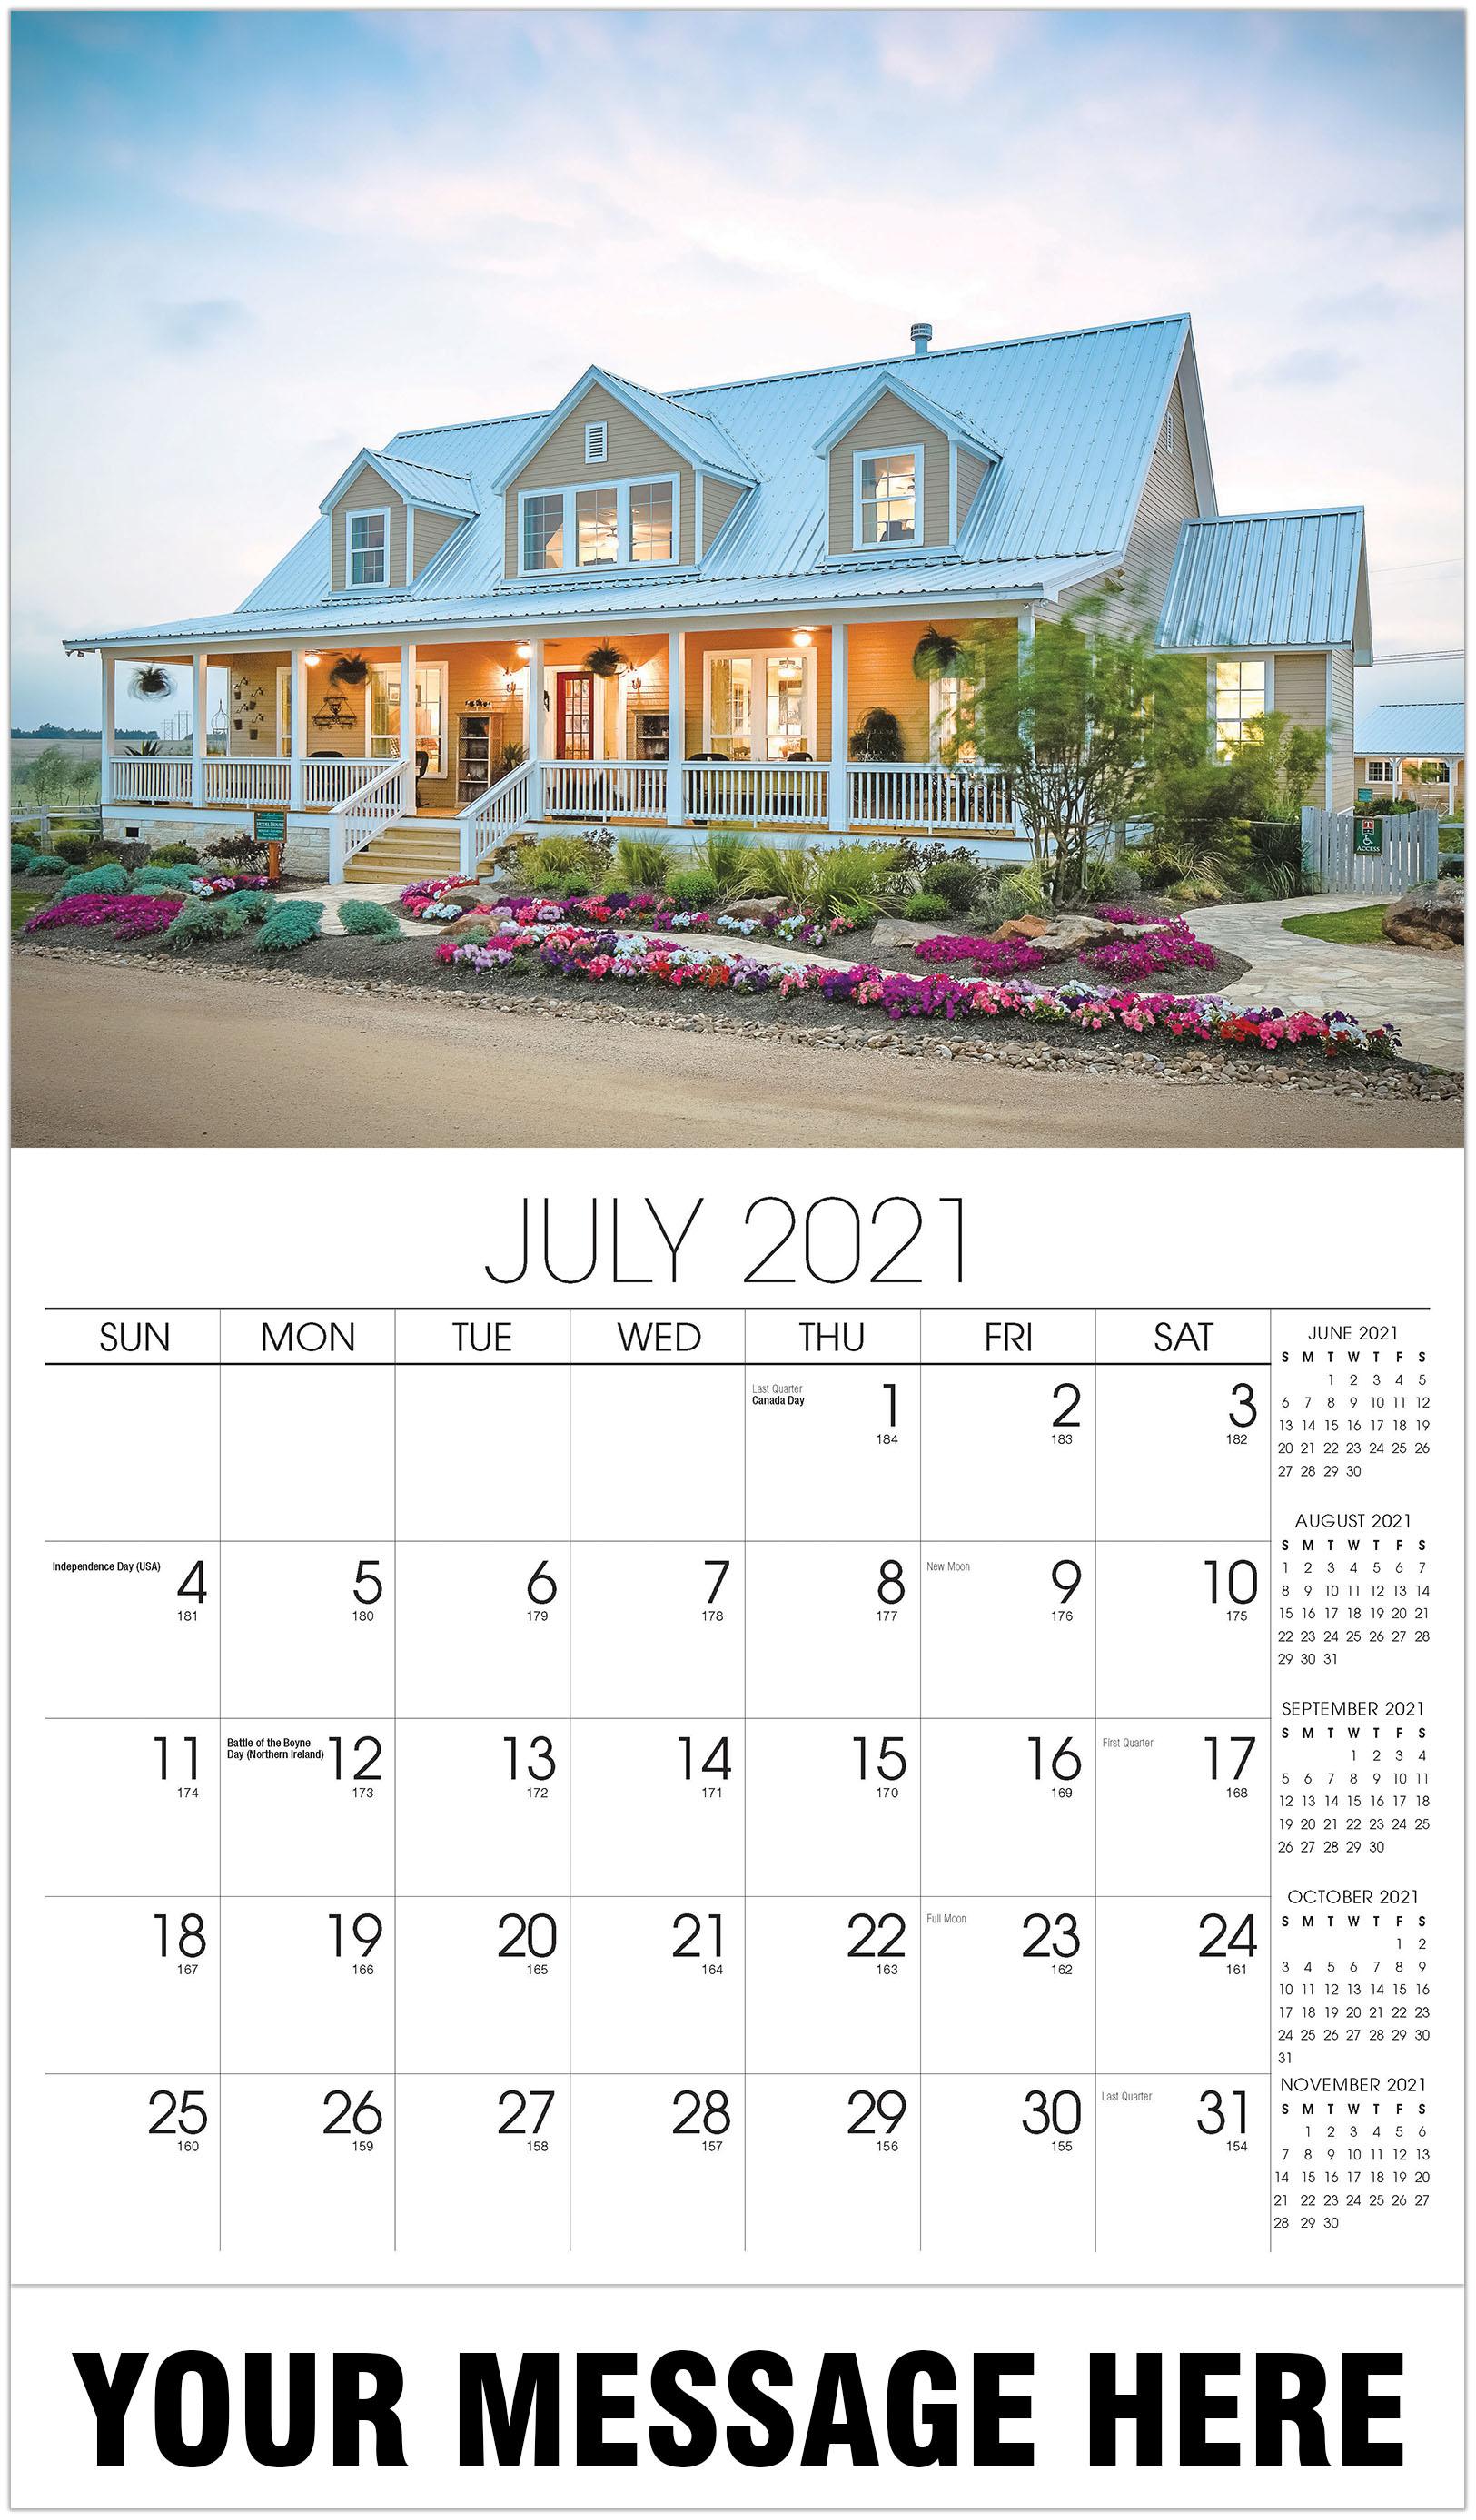 2021 House Calendar 2021 Advertising Calendar | Luxury Custom Home Wall Calendar